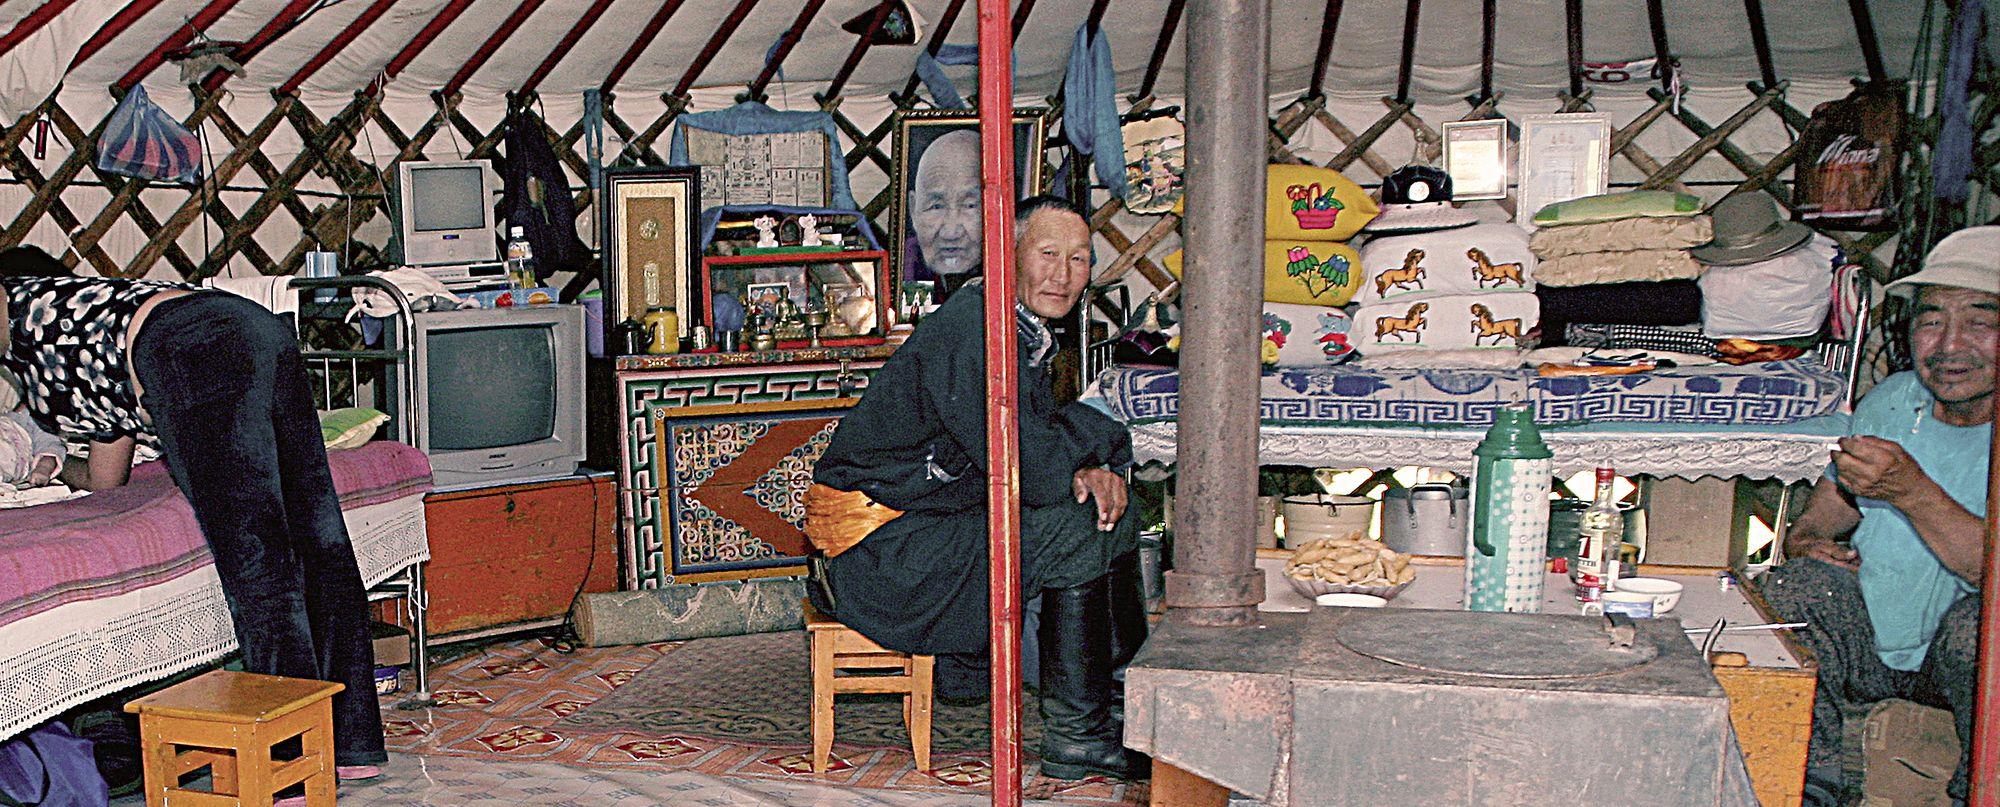 MONGOLIA. Desierto de Gobi, Estepa Central y Lago Khovsgol